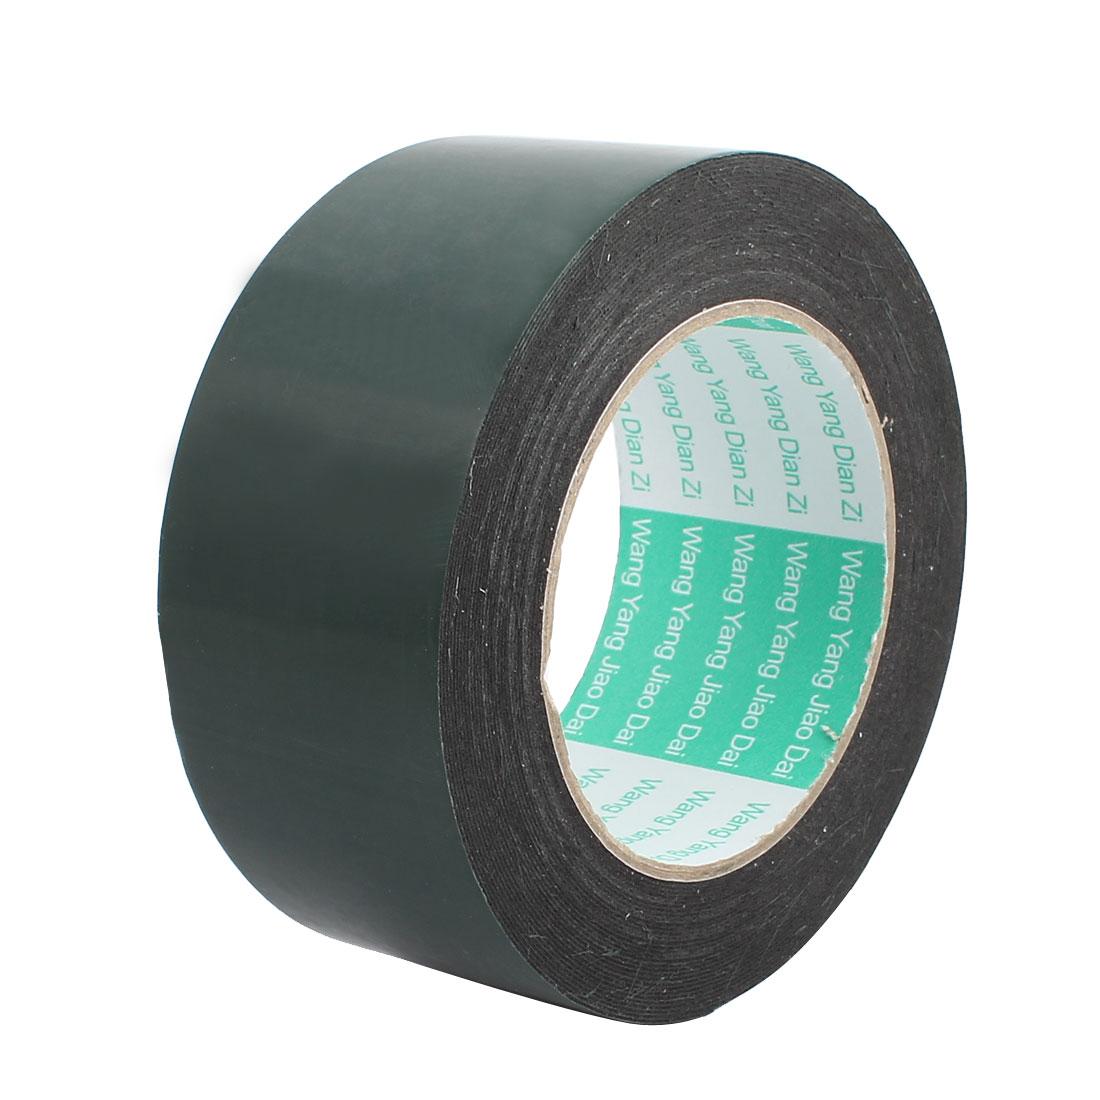 50mmx0.5mm Double Sided Sponge Tape Adhesive Sticker Foam Glue Strip Sealing 10m